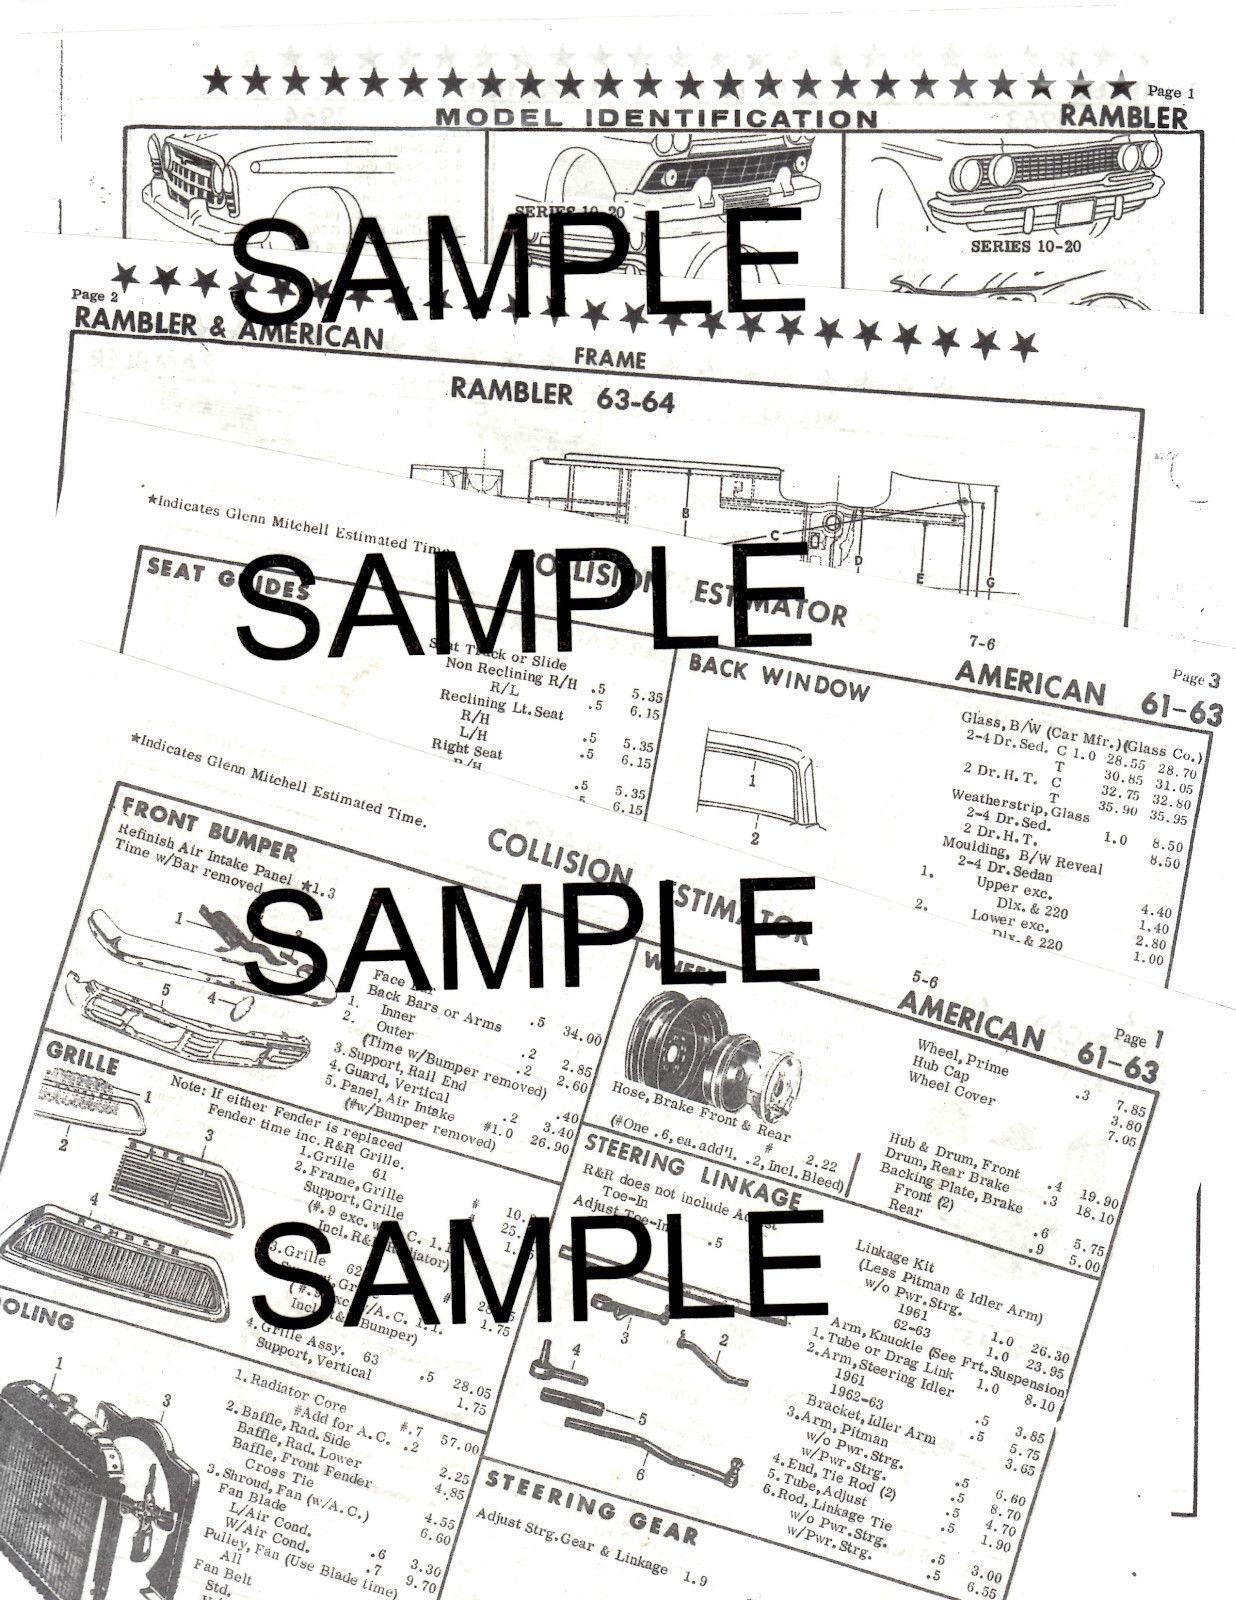 1962 CHEVROLET IMPALA BELAIR BISCAYNE 62 BODY PARTS LIST